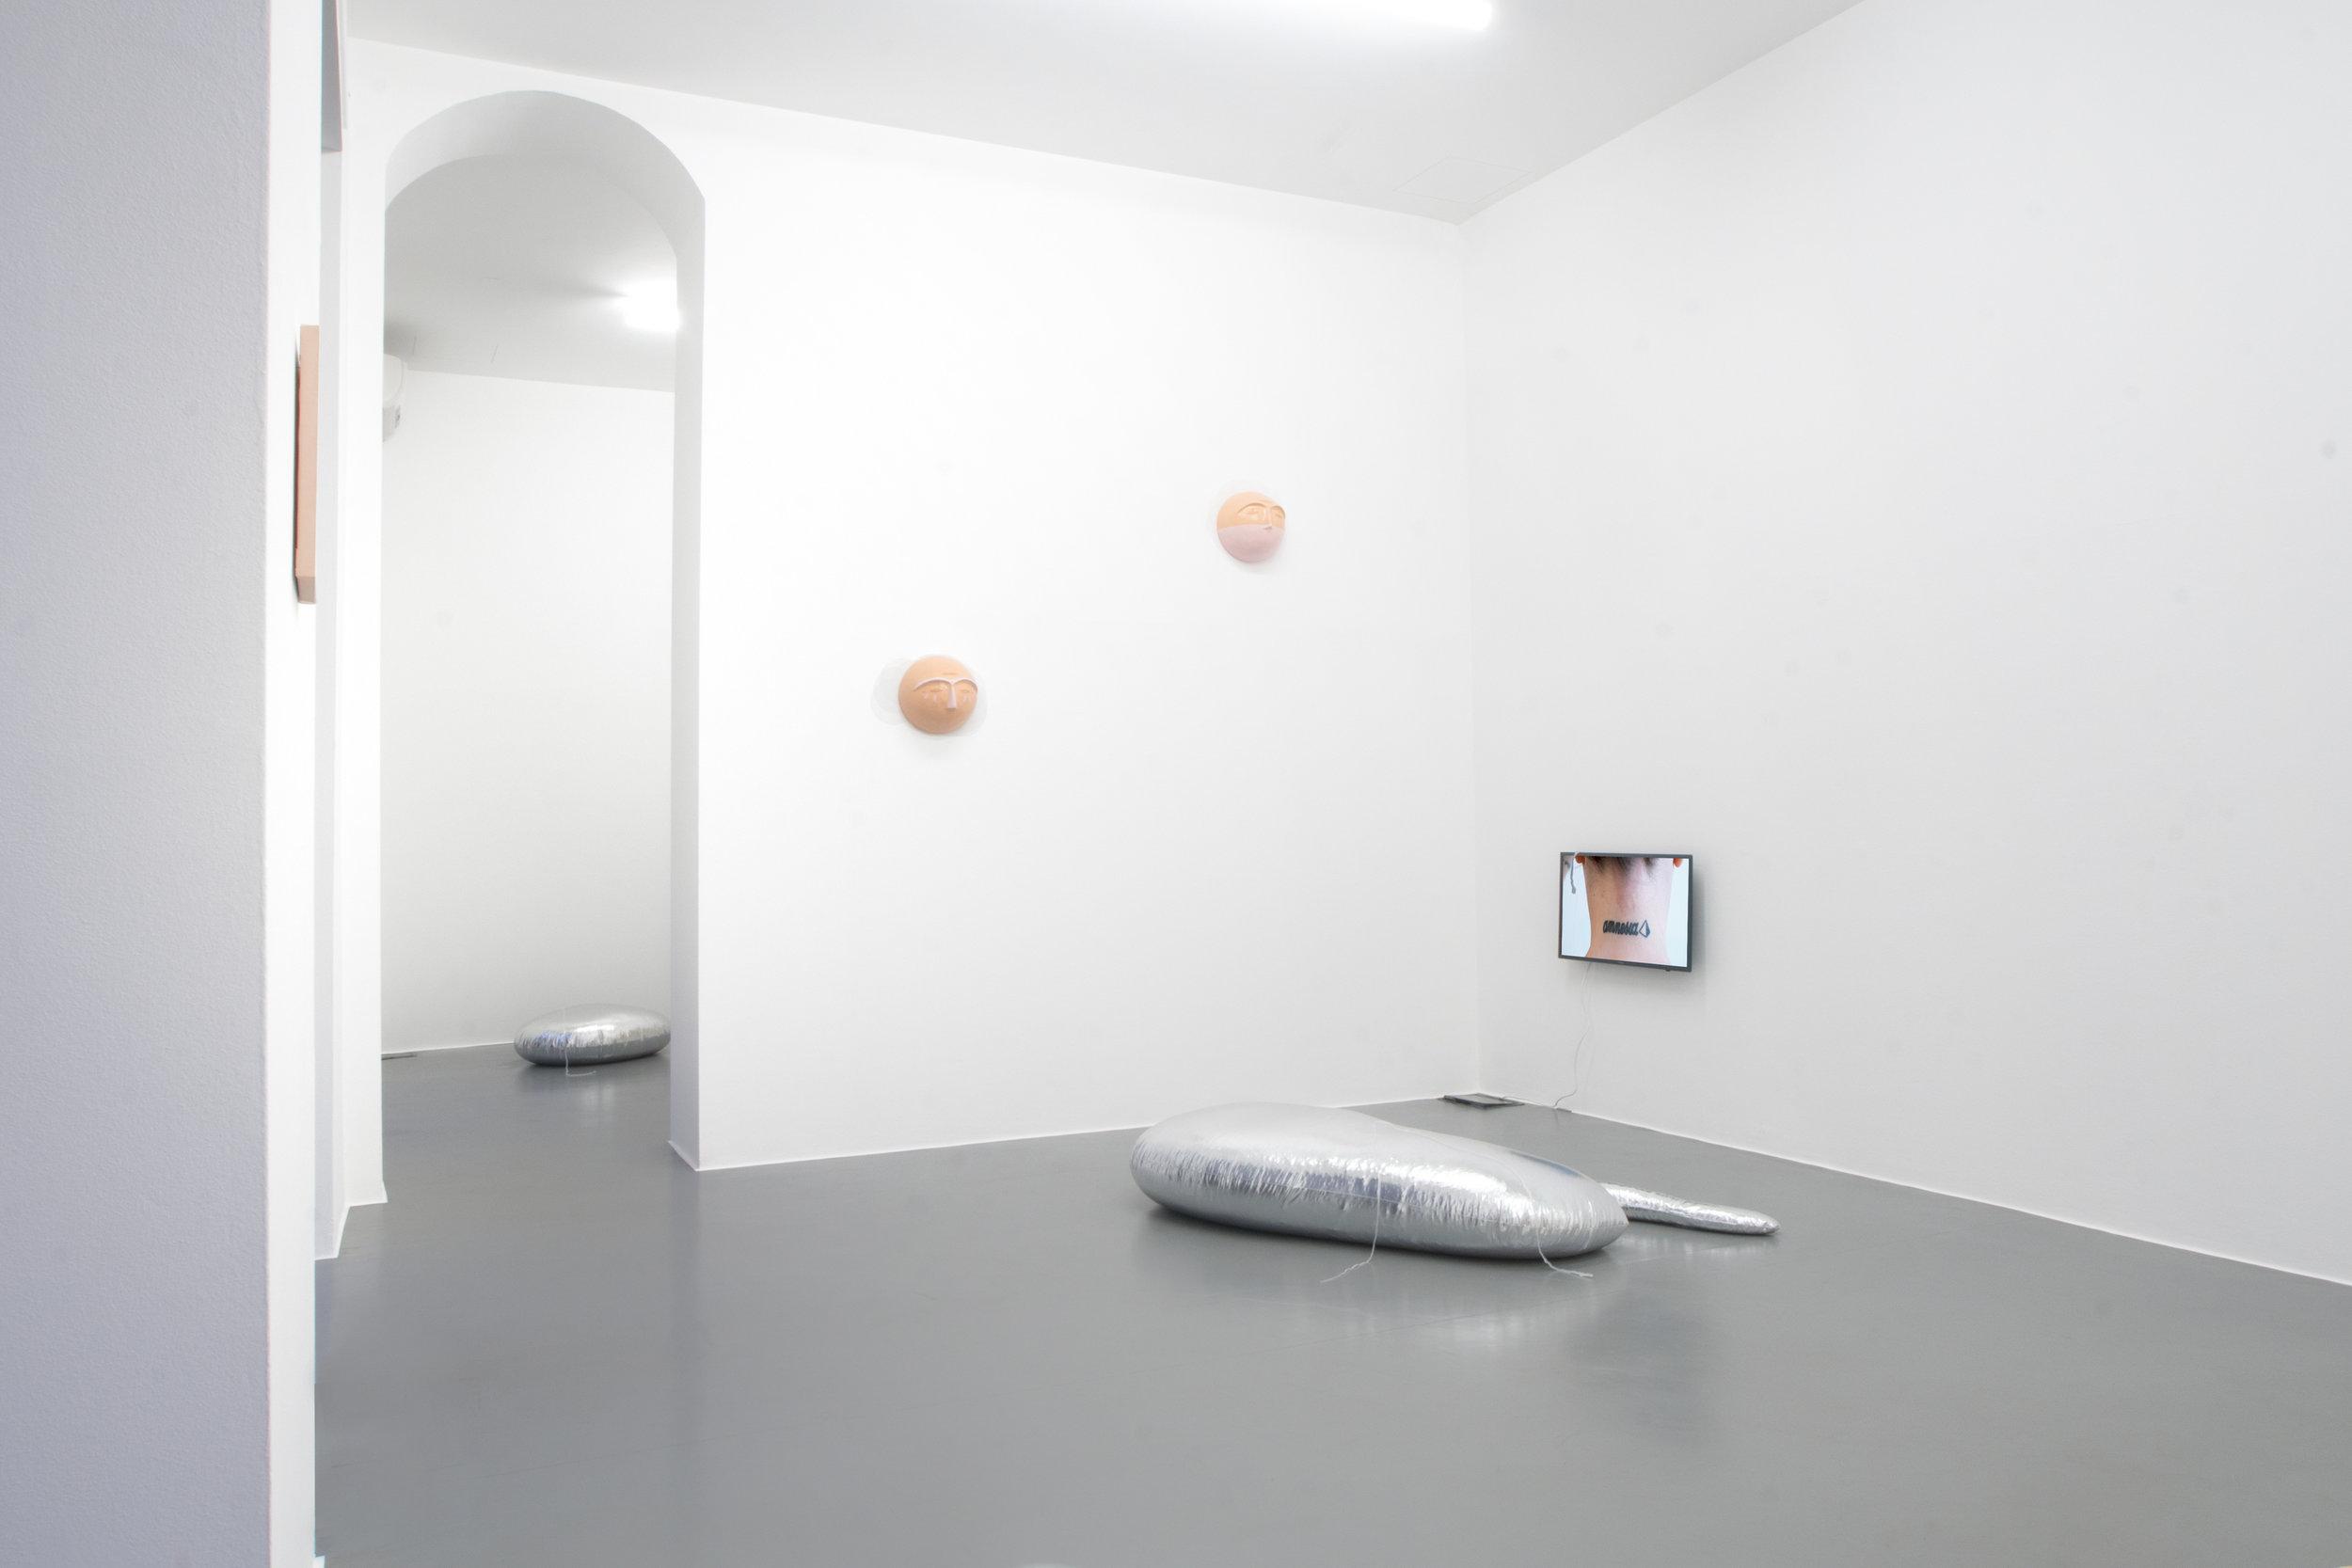 3 Gioia Di Girolamo - The Mating Season of Frenzy Breeze, Galleria Bianconi (ph Massimiliano Costantini).jpg